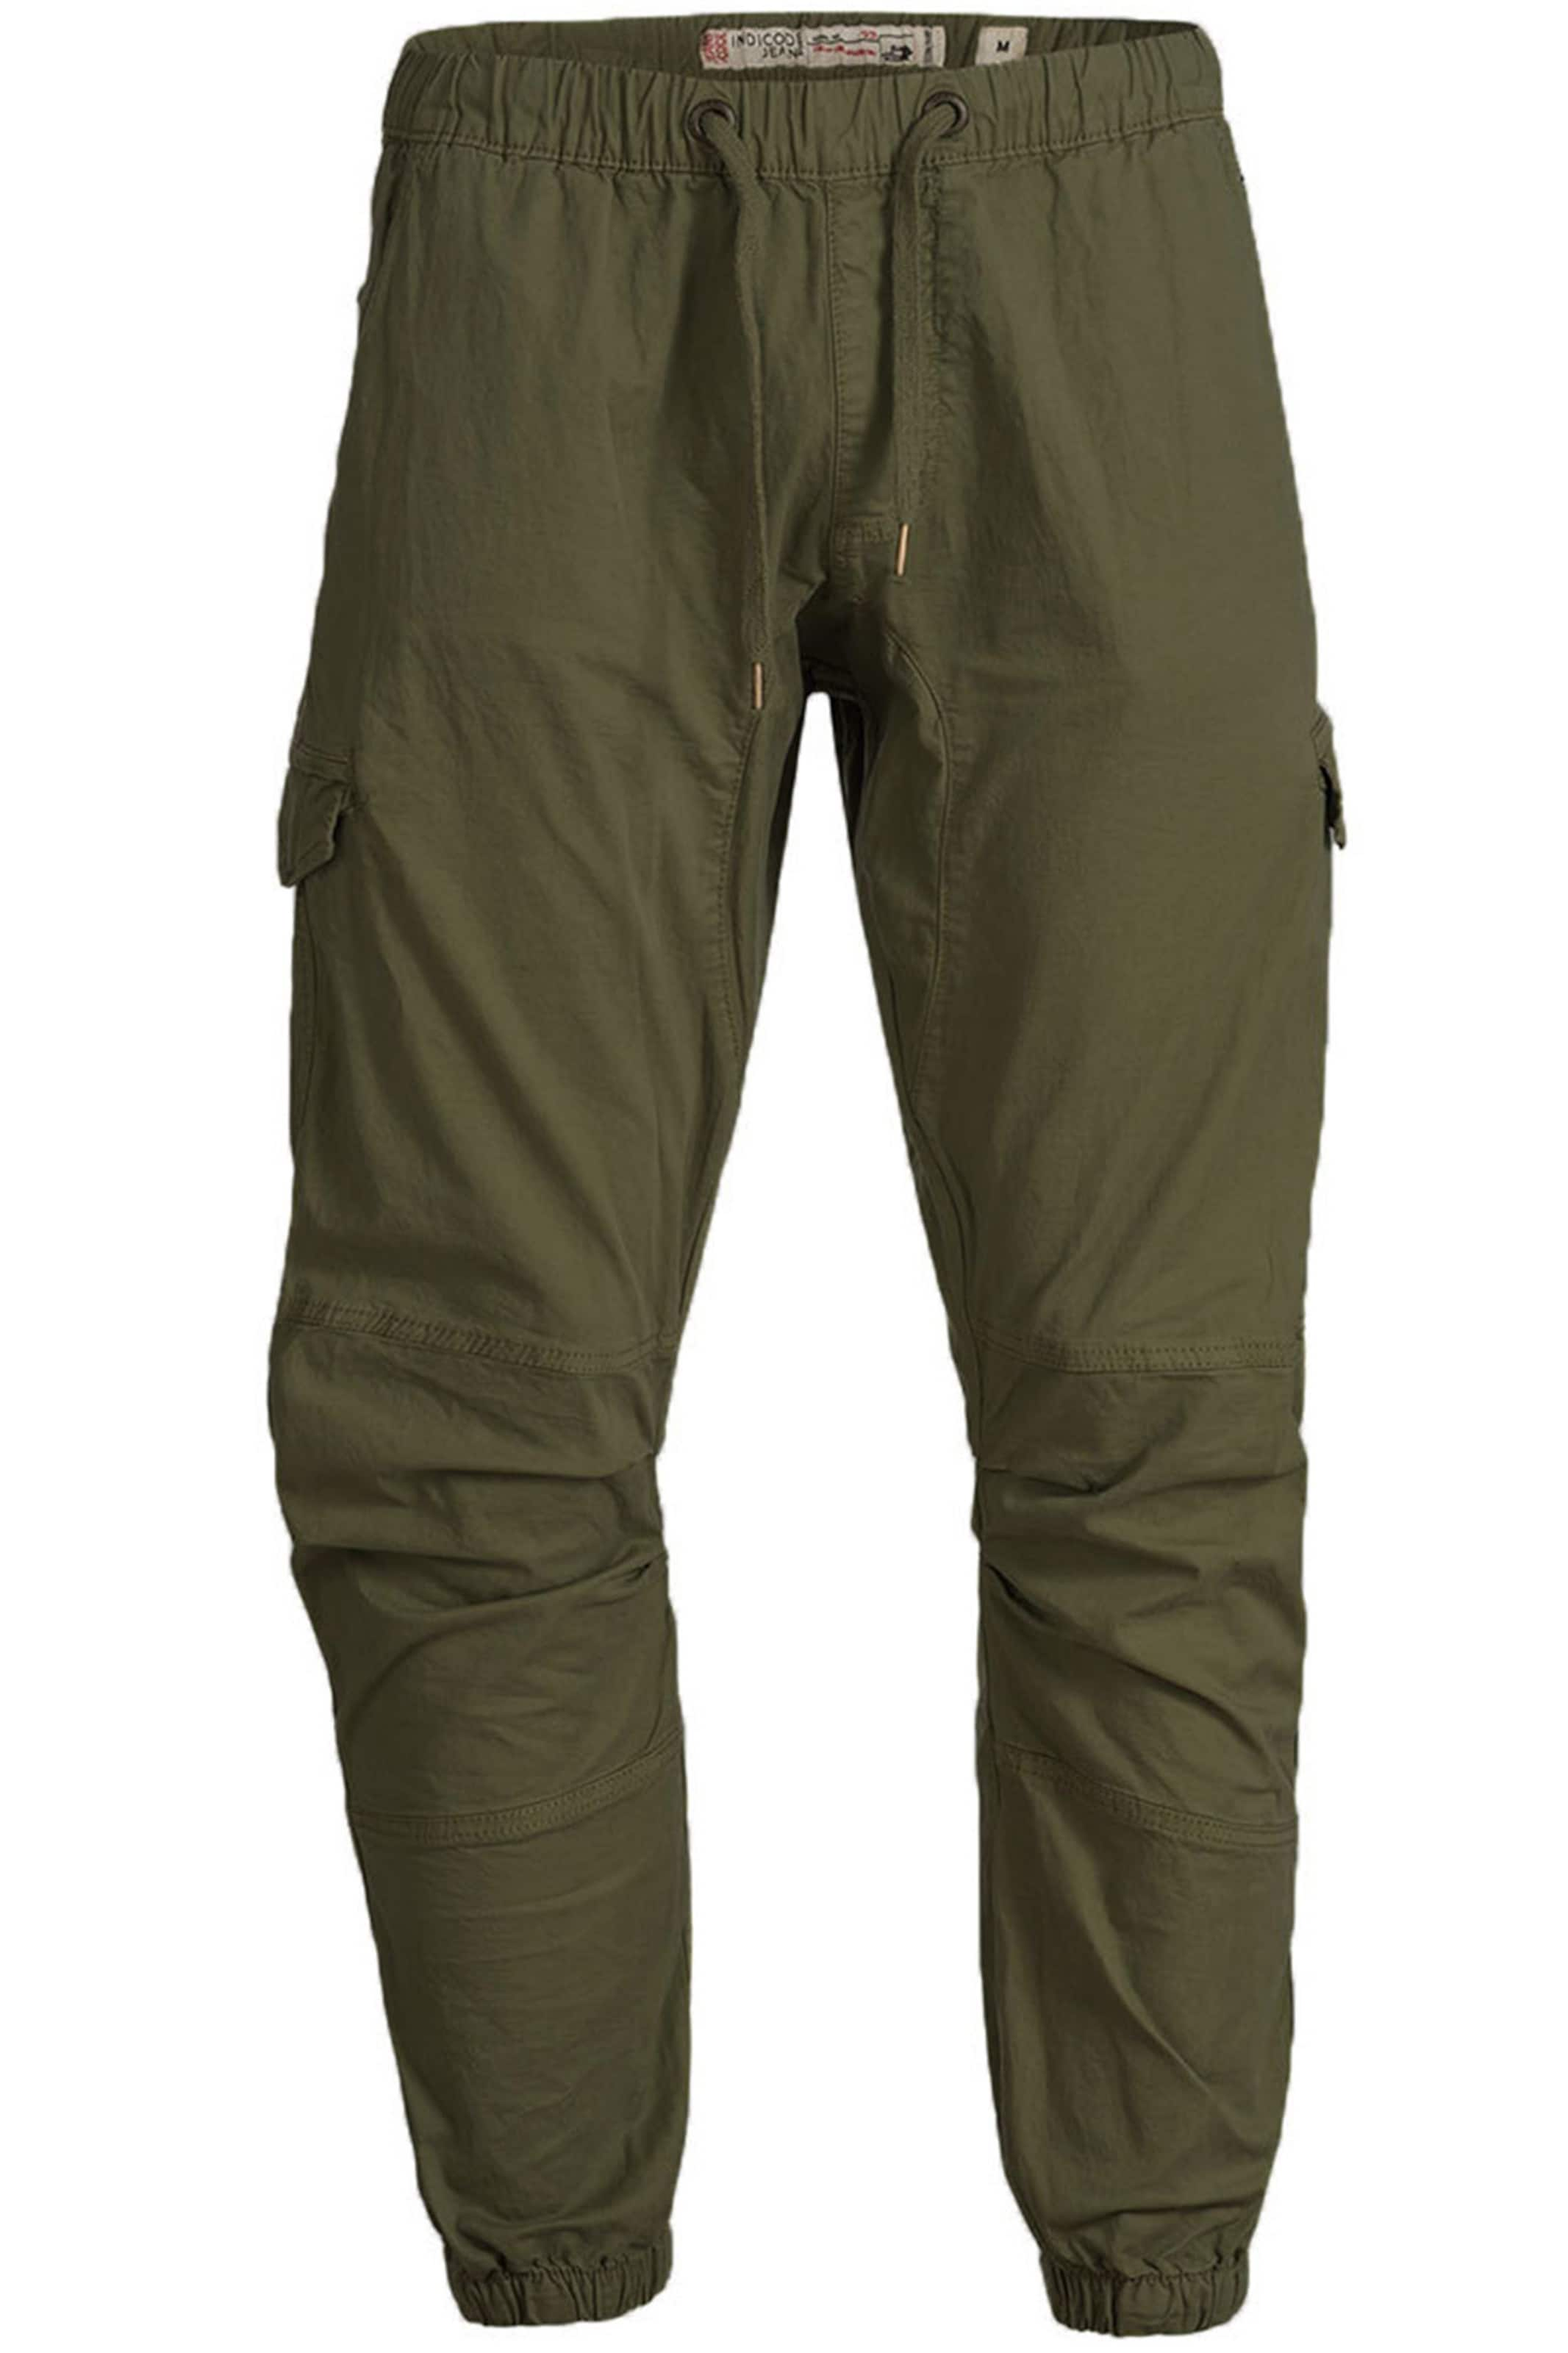 Khaki Indicode Jeans Cargohosen In Cargo' 'levi QrxCdhts